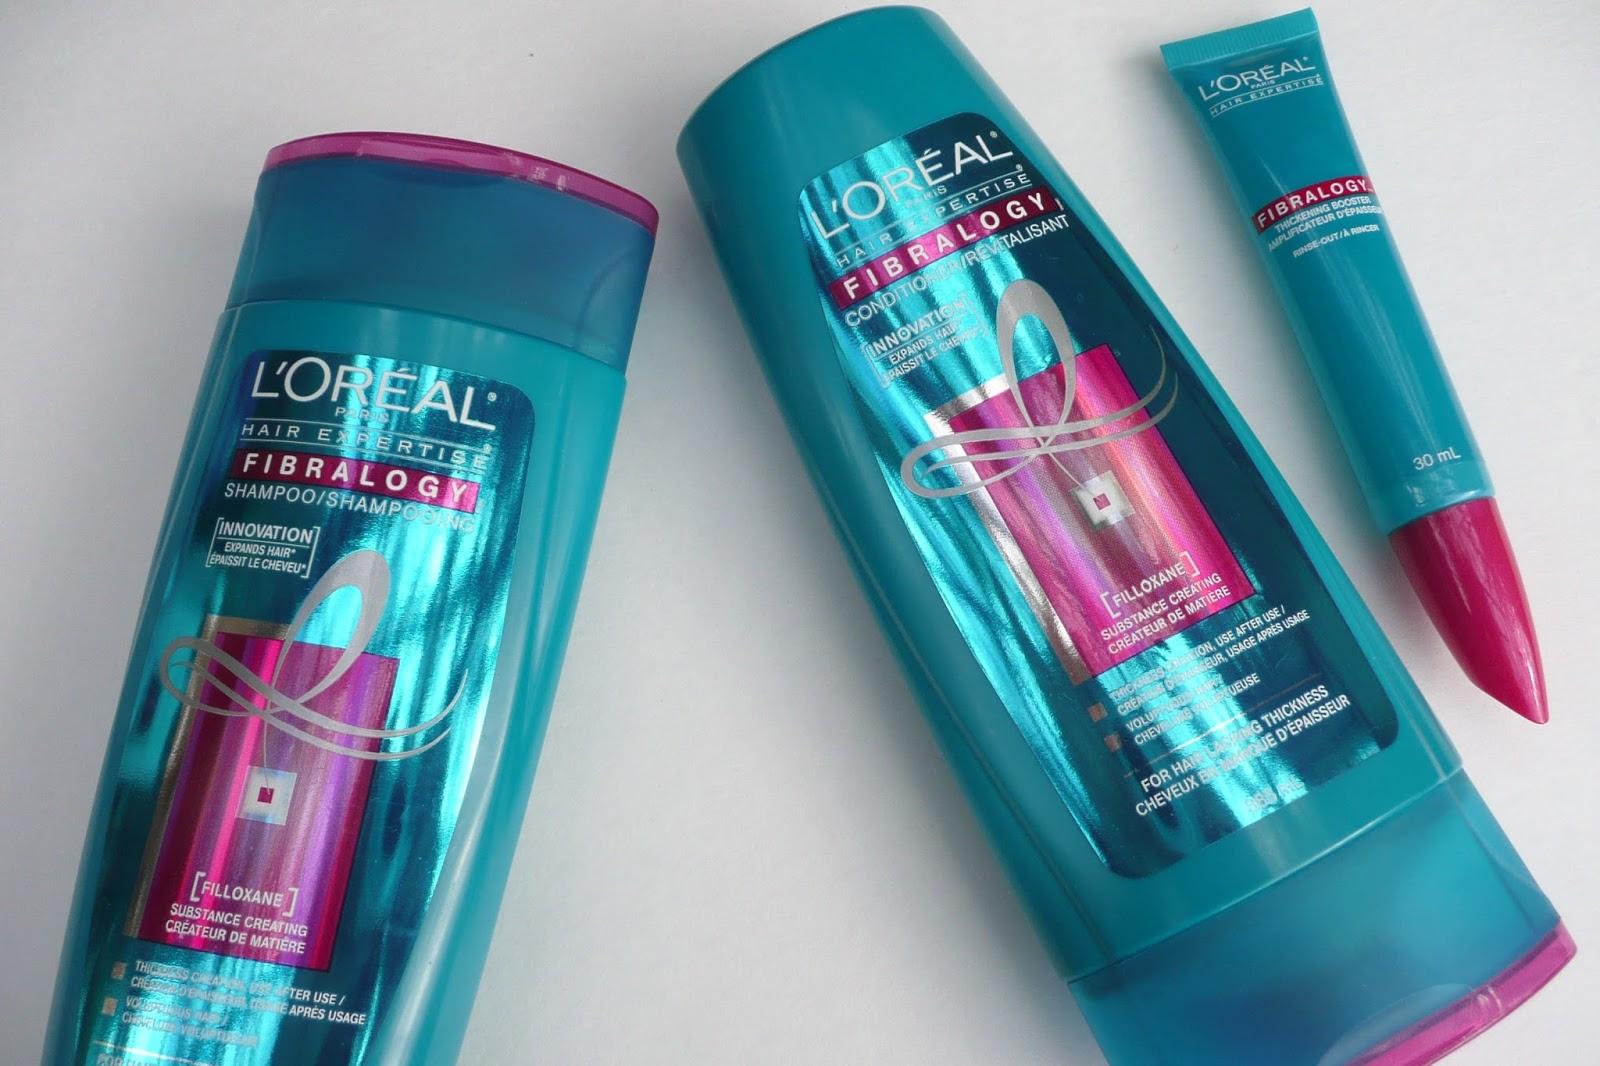 Review: L'Oreal Fibralogy Haircare*